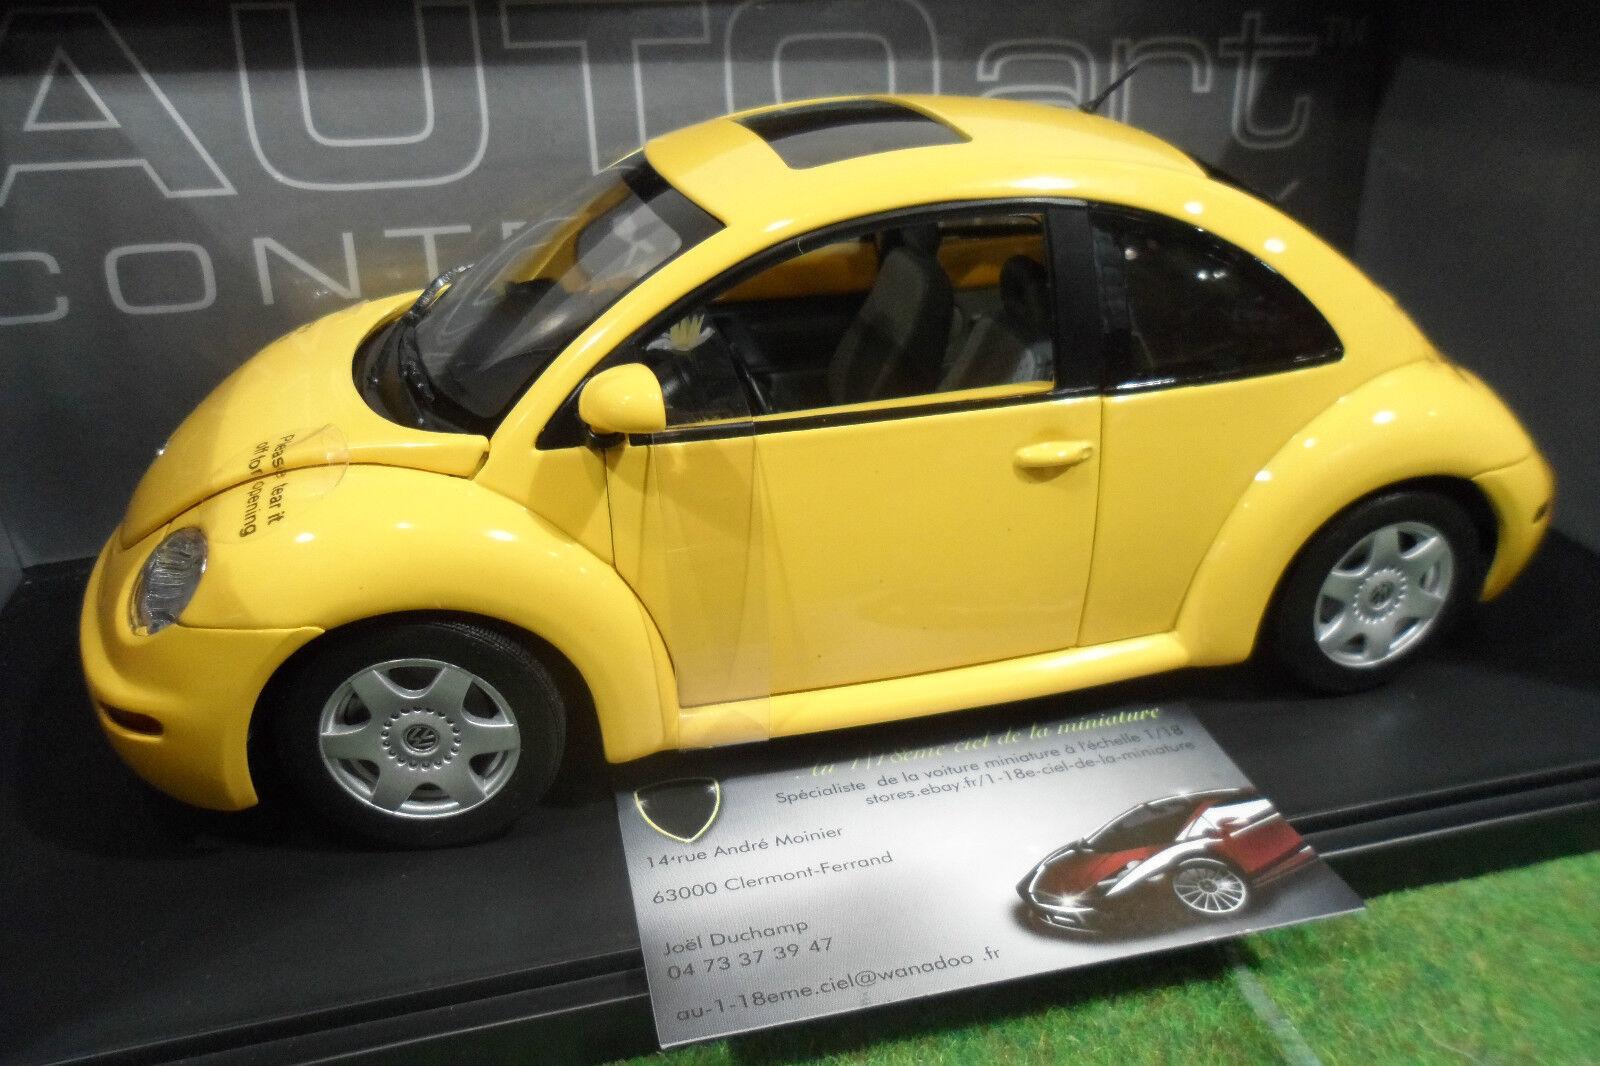 VOLKSWAGEN NEW BEETLE giallo 1 18 AUTOart Contemporary 79731 voiture miniature